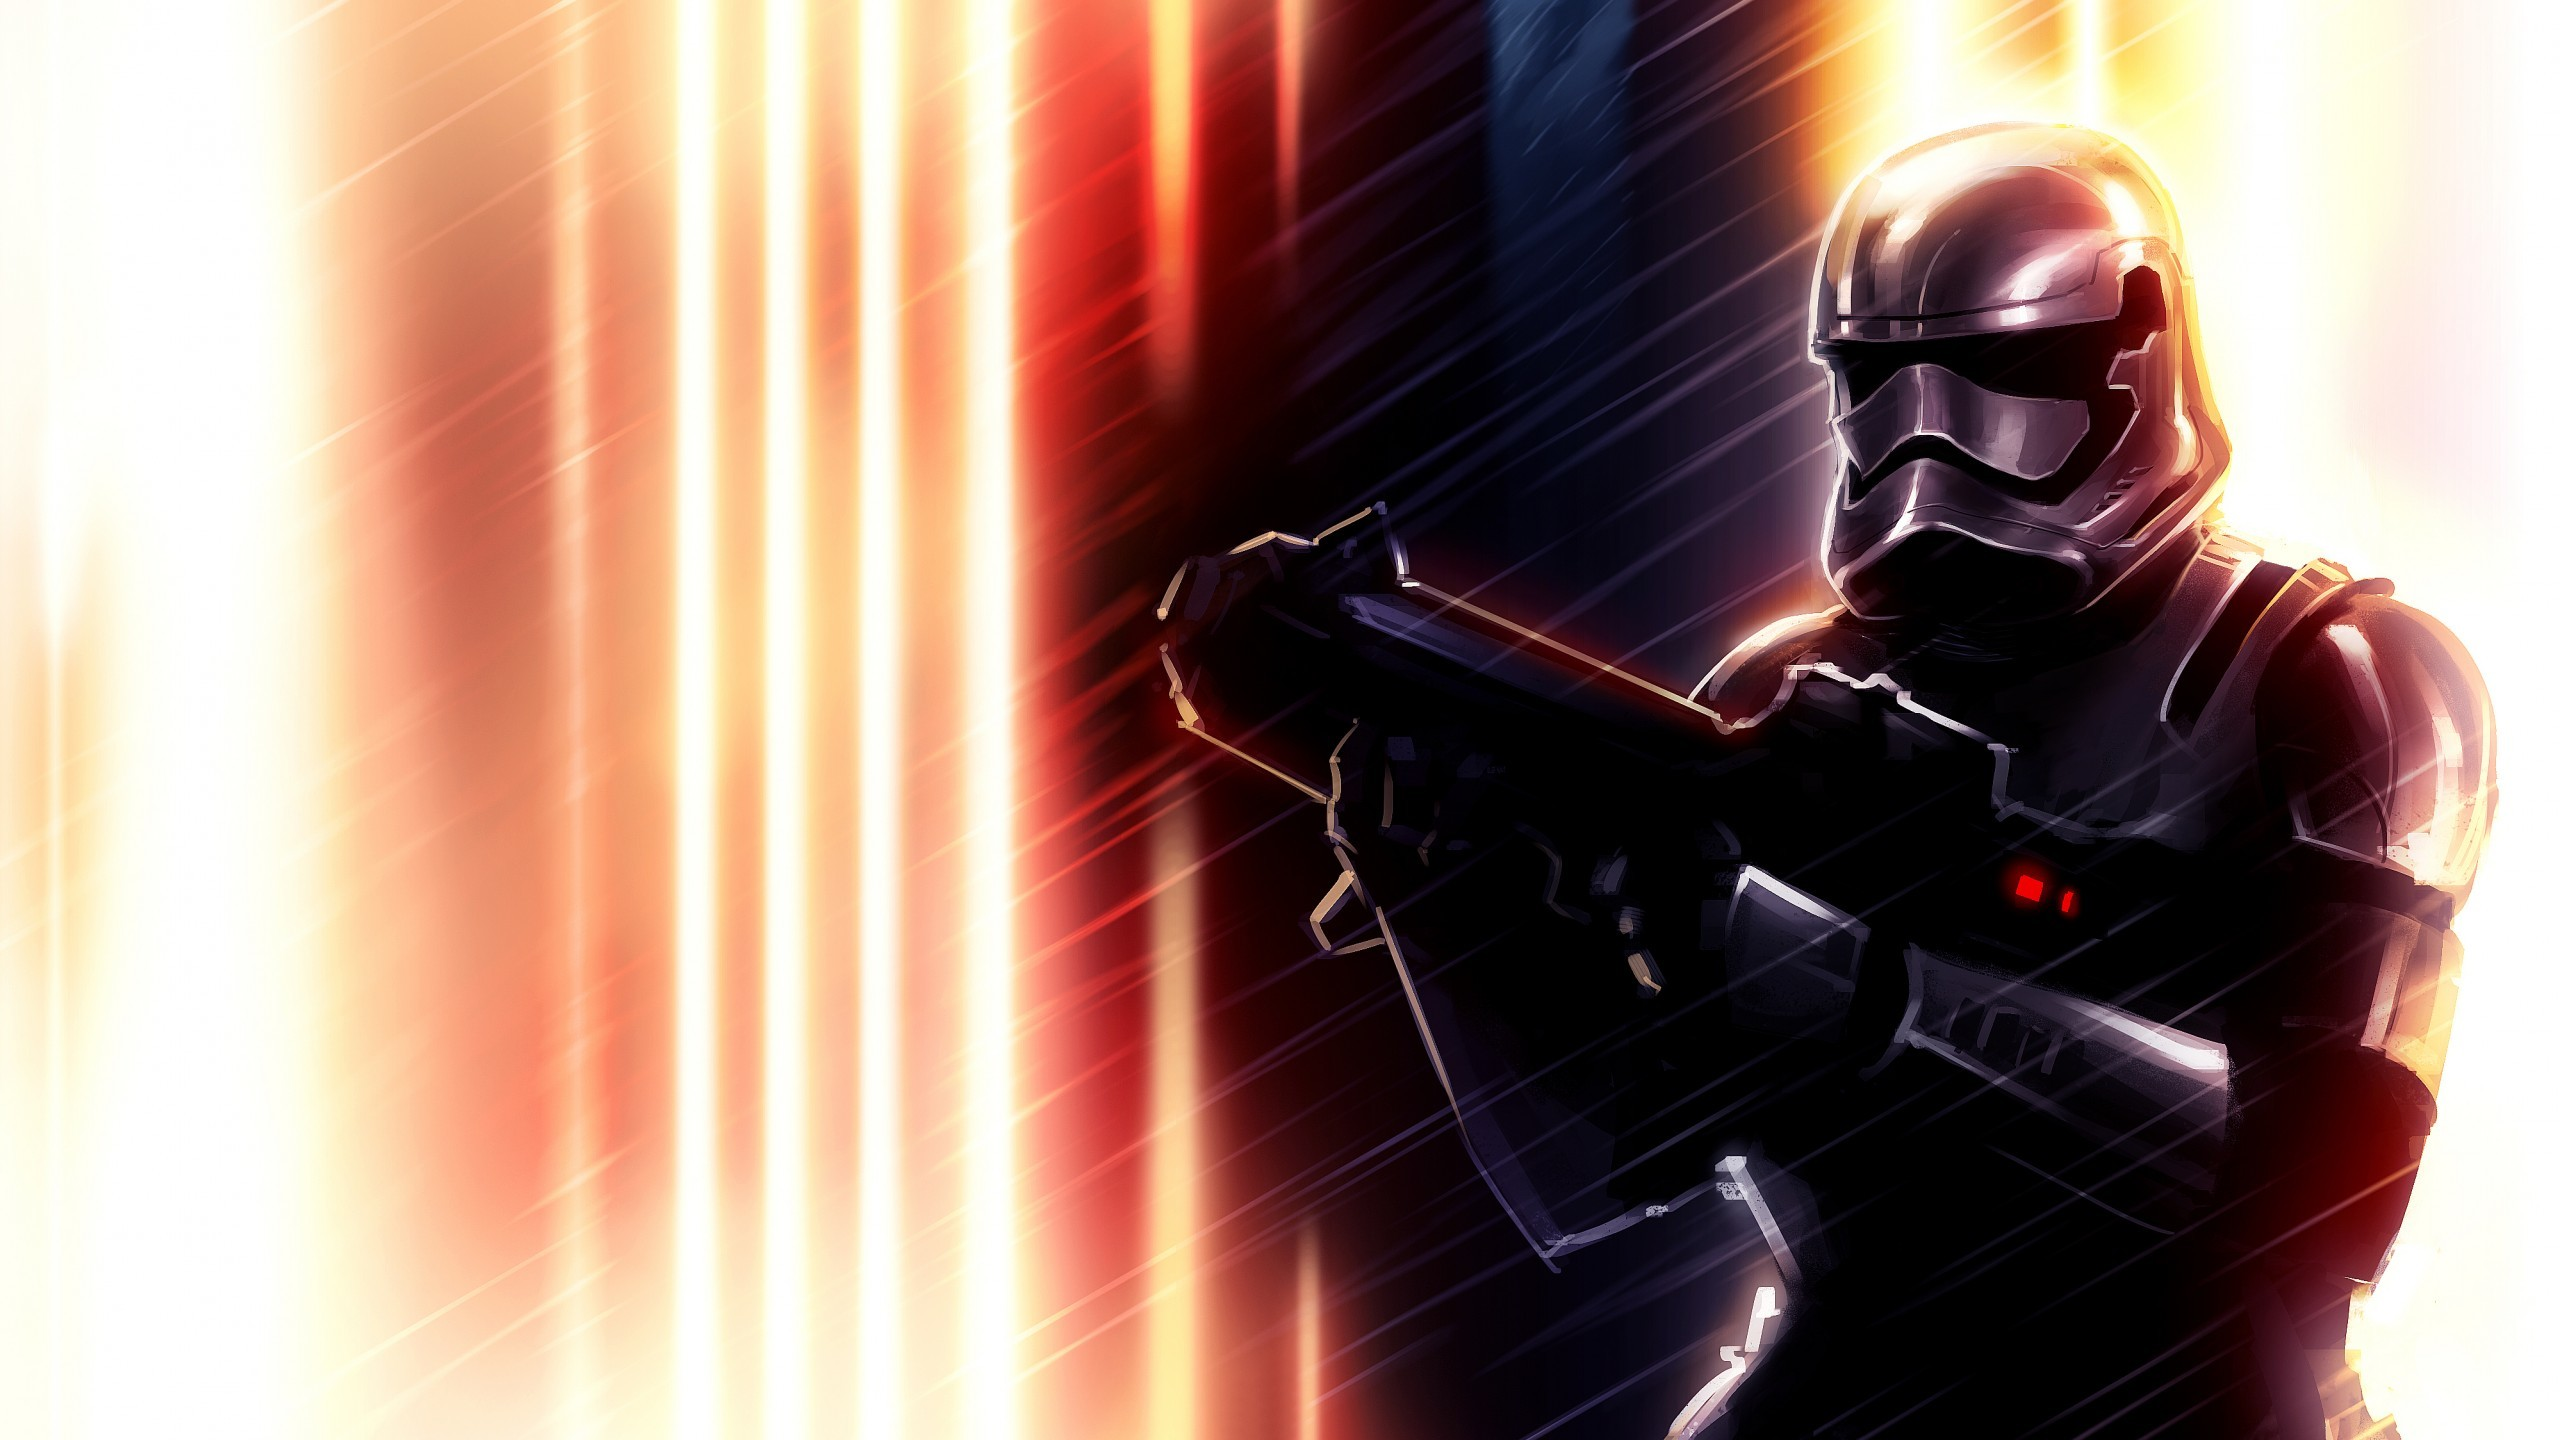 Wallpaper stormtrooper, episode vii, star wars